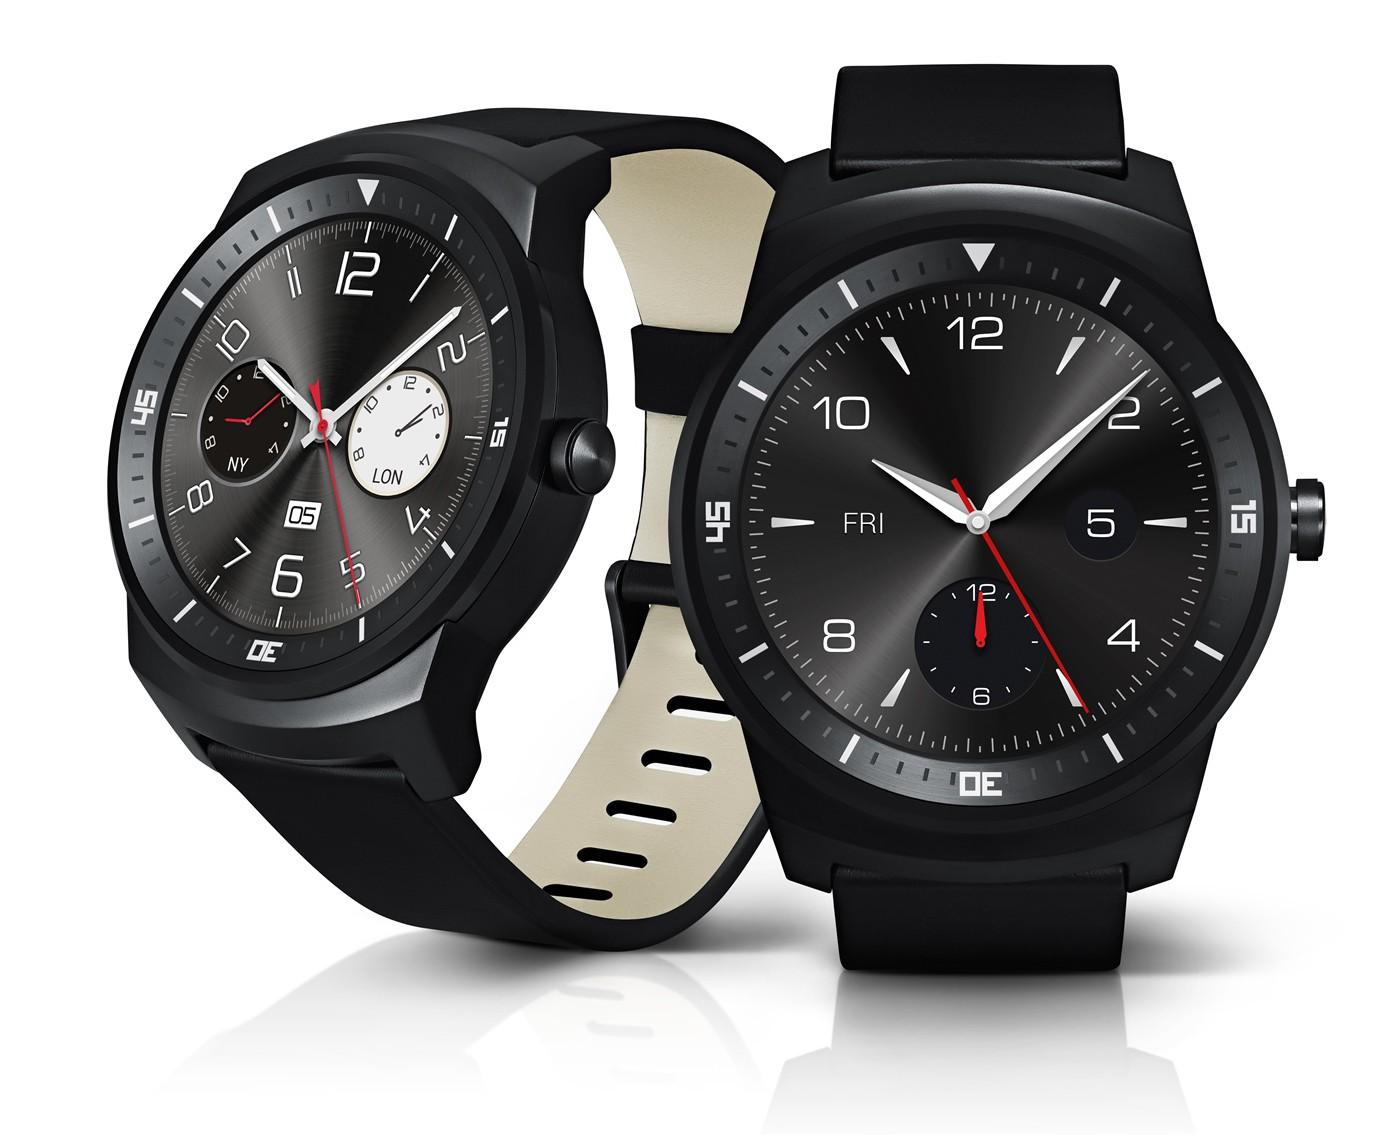 LG G Watch R press